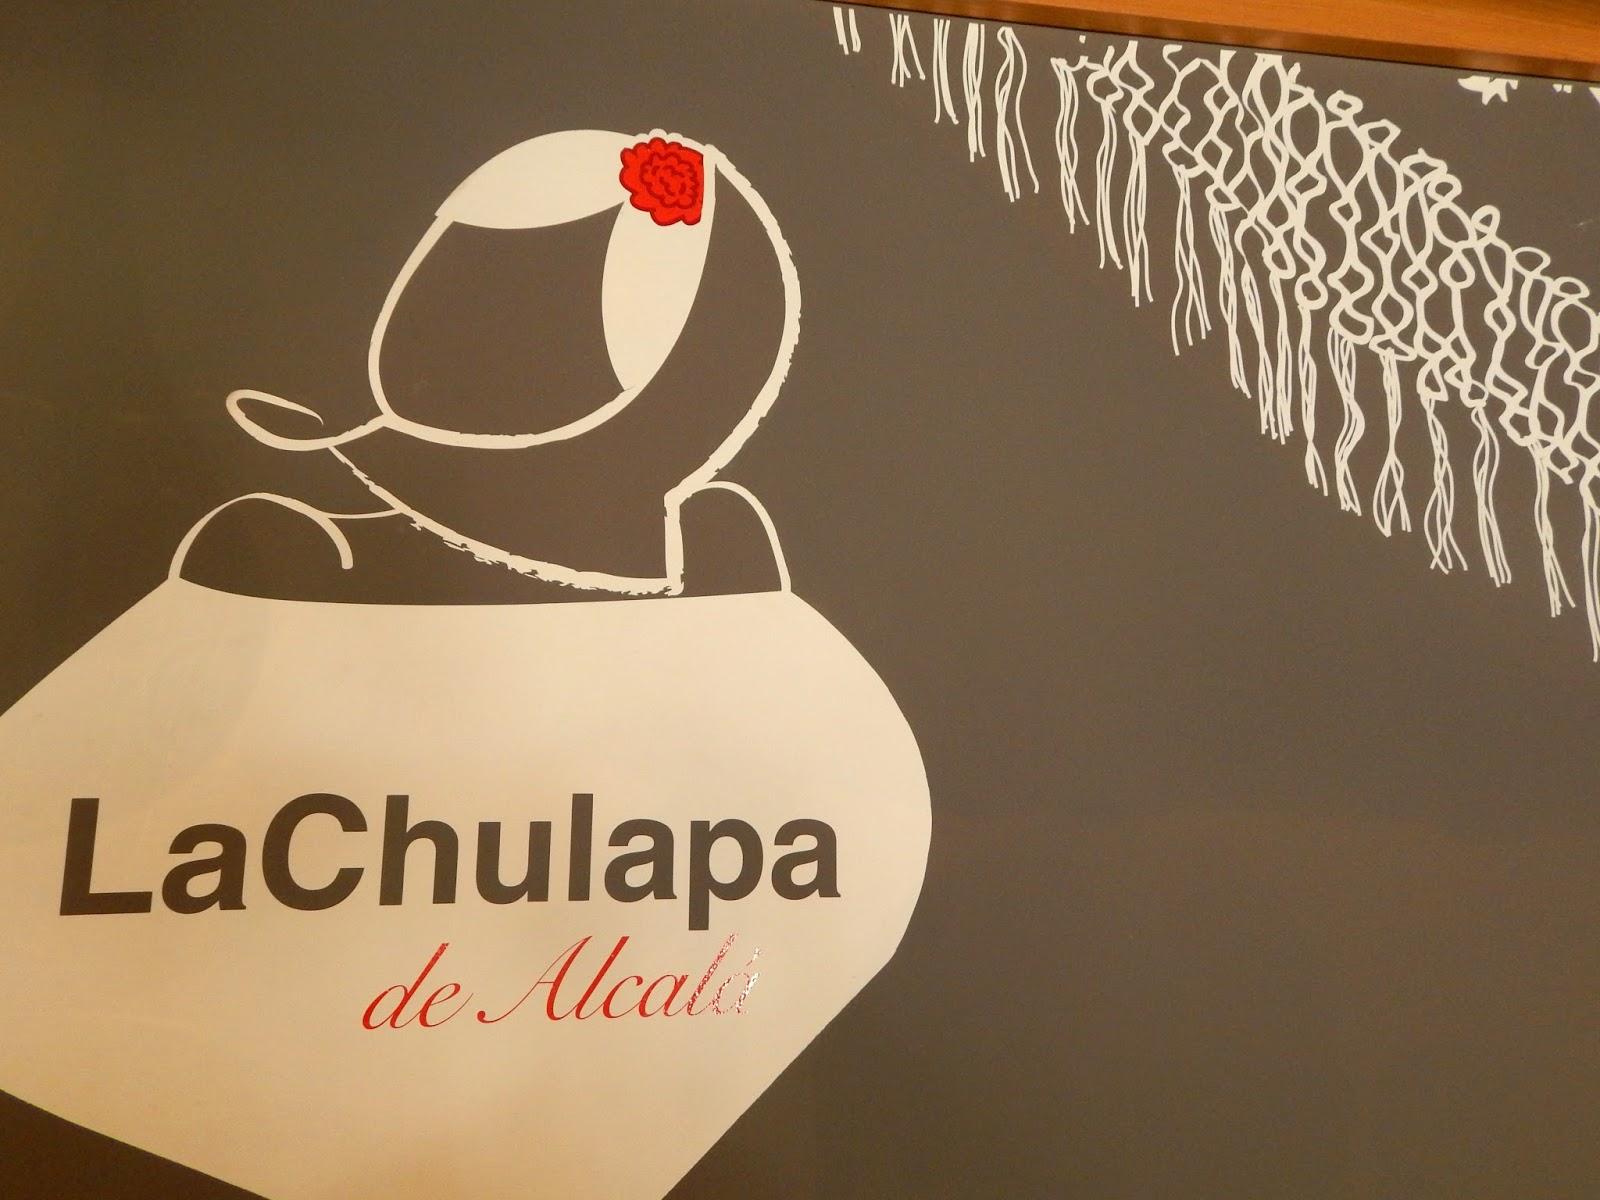 chulapa-alcala-cocina-mediterranea-castizo